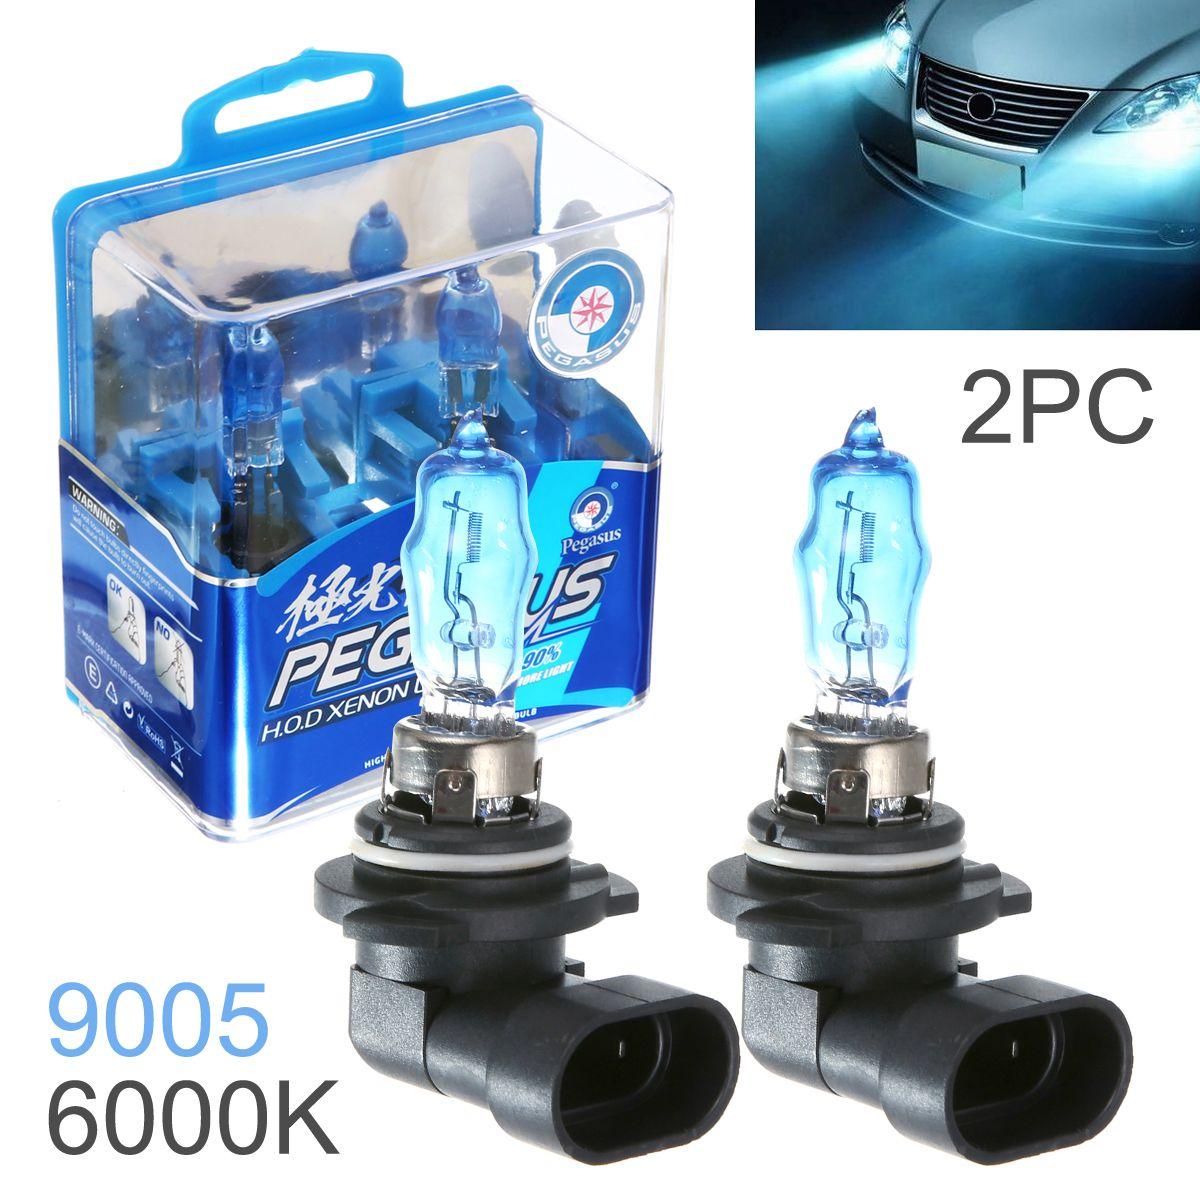 Wholesale 9005 100W White Light Super Bright Car HOD Xenon Halogen Lamp Auto Front Headlight Fog Bulb CLT_60Y